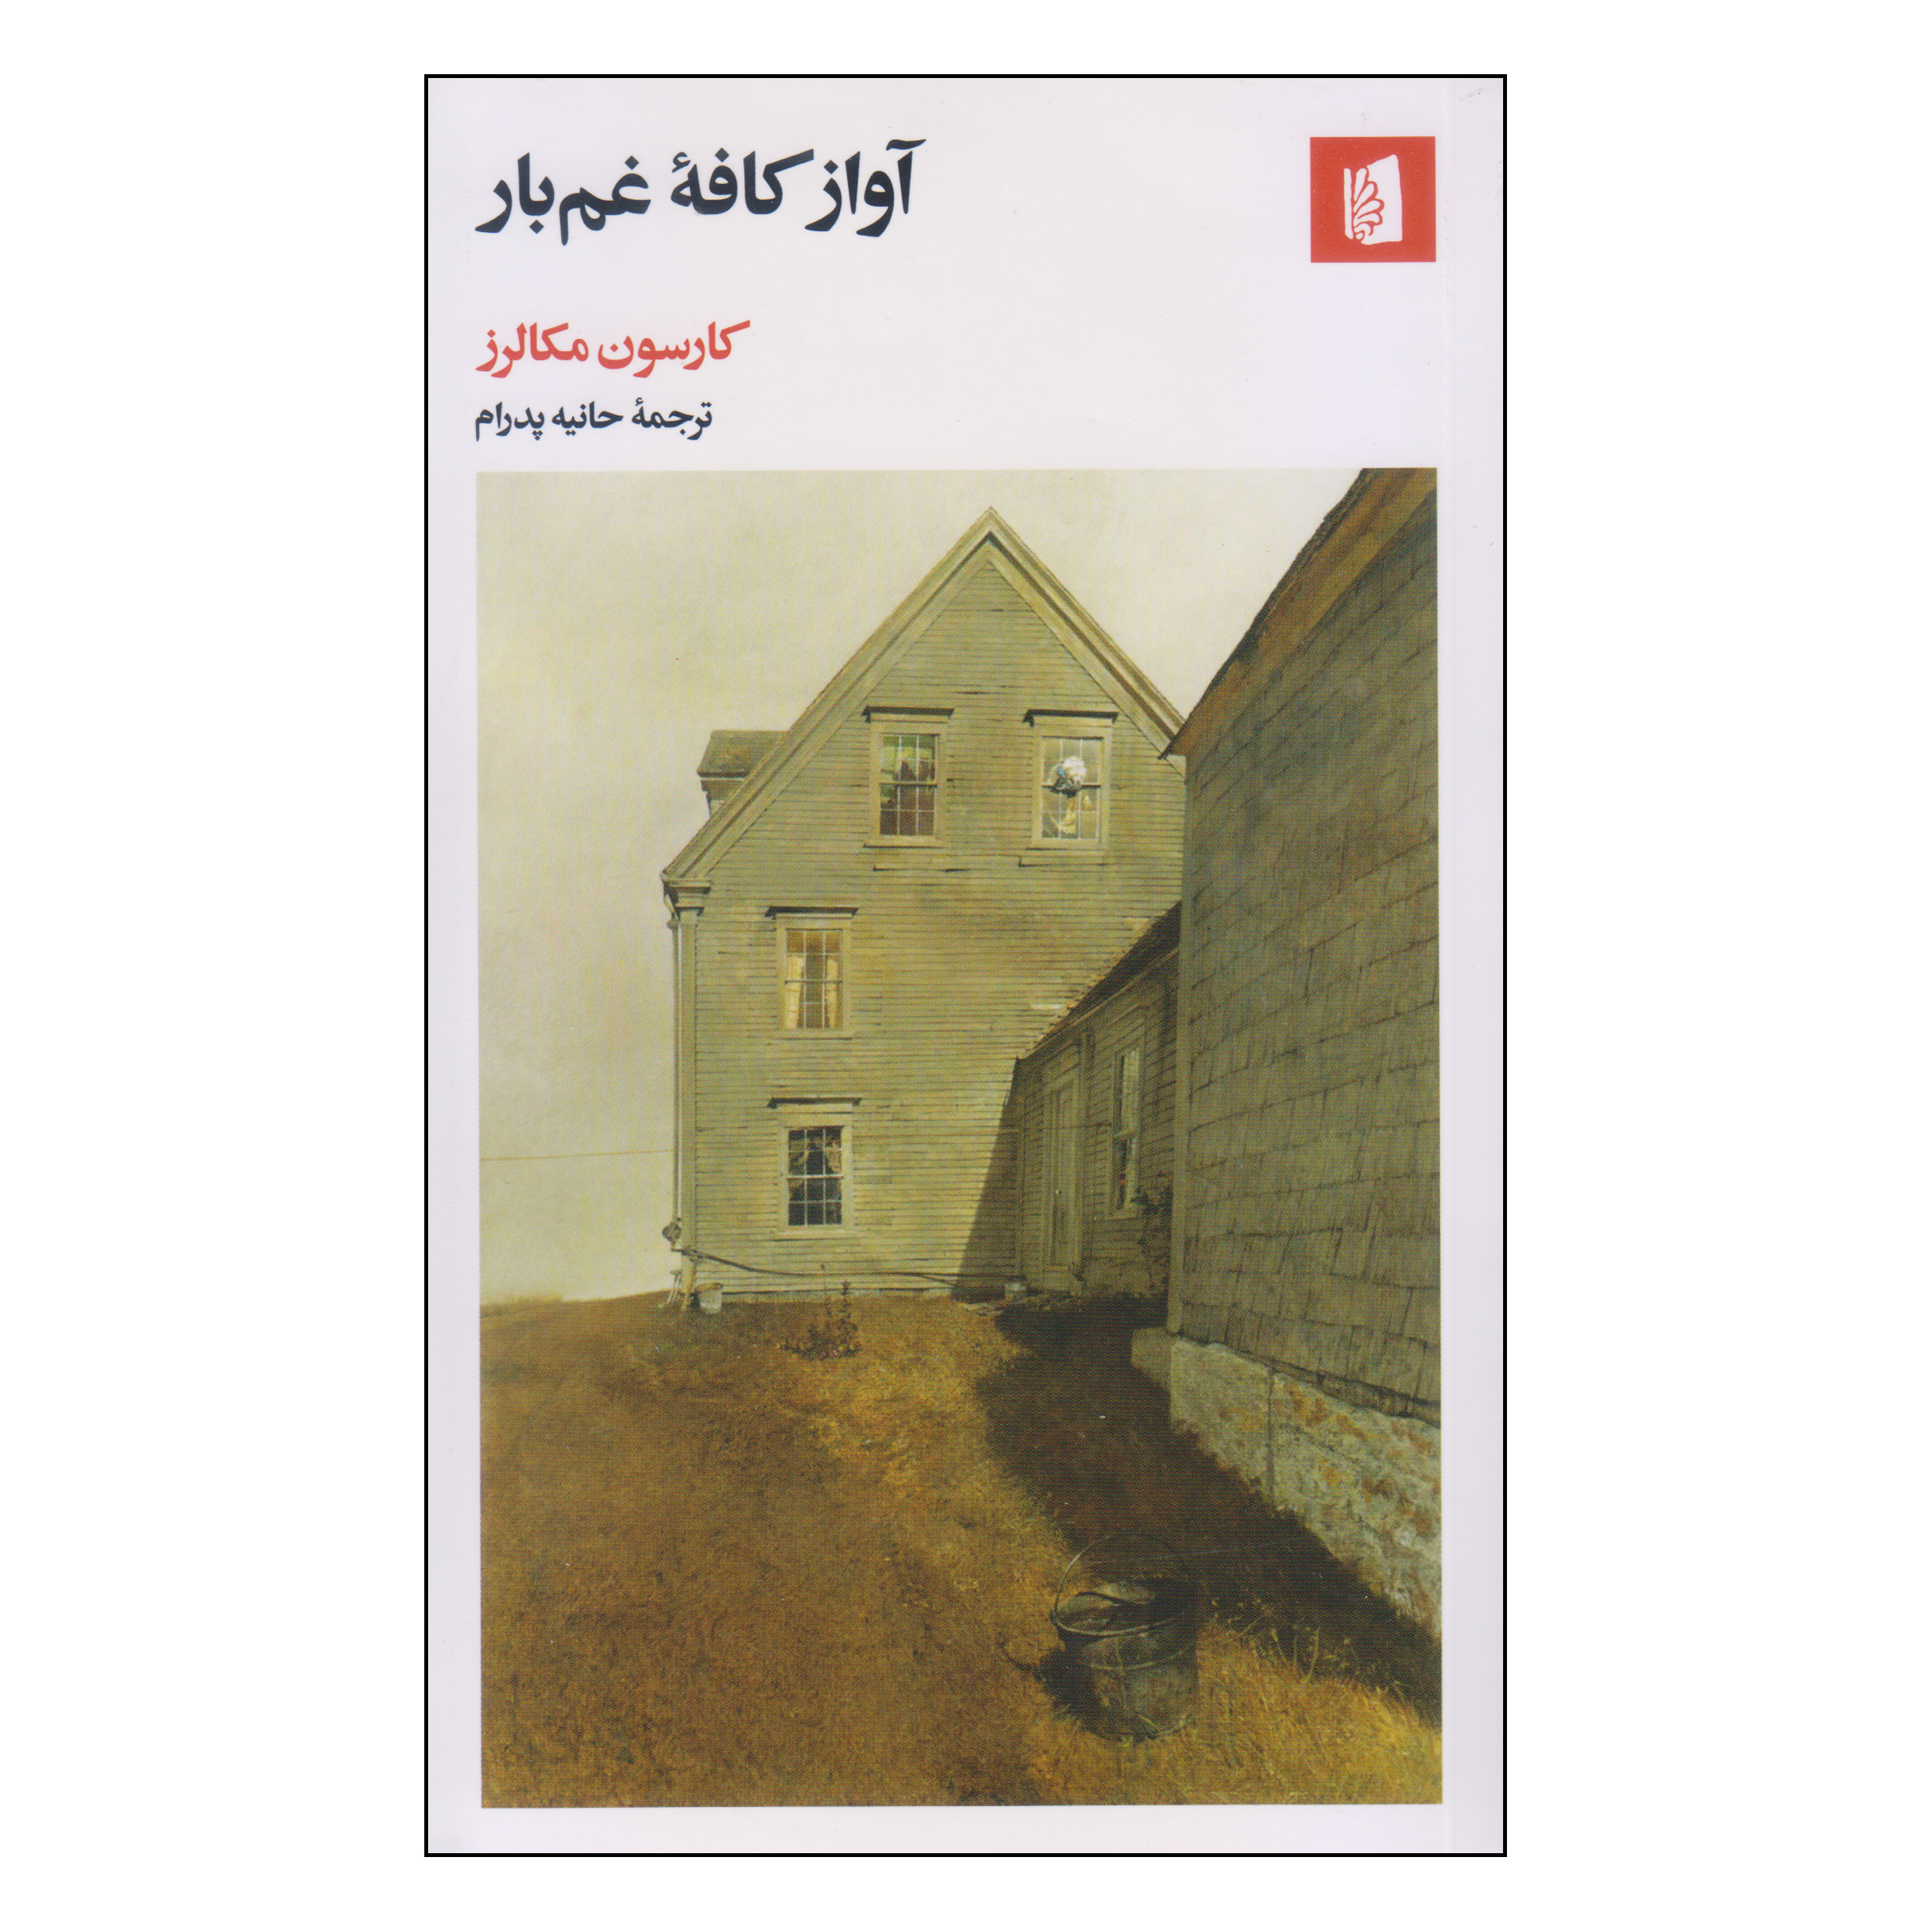 کتاب آواز کافه غمبار اثر کارسون مکالرز نشر بیدگل